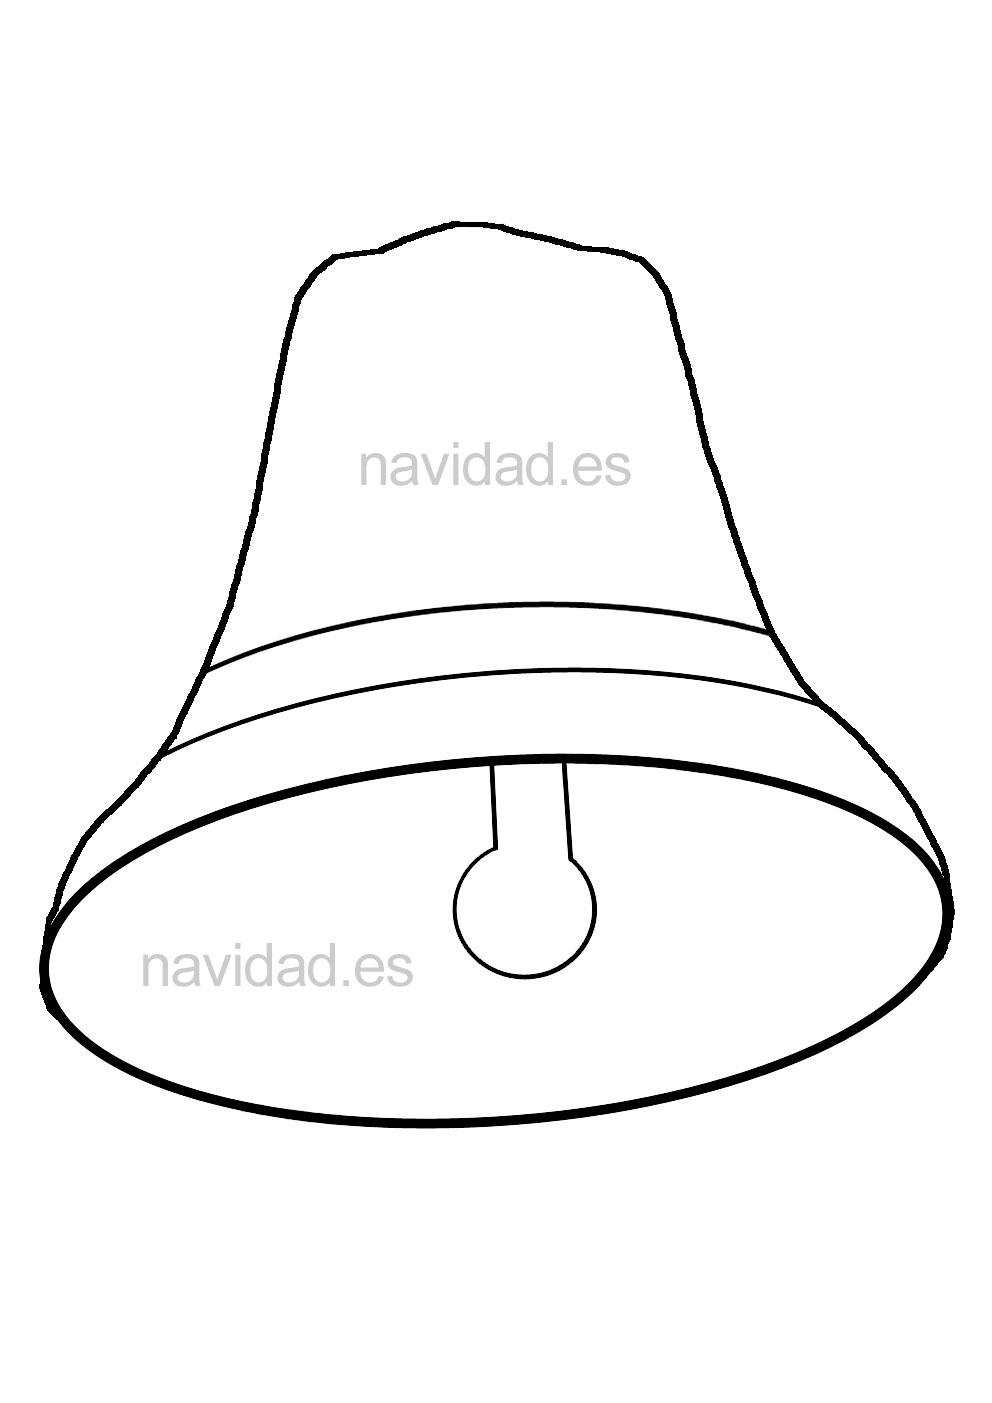 campanas de navidad, imprimir, colorear, dibujar Imagui